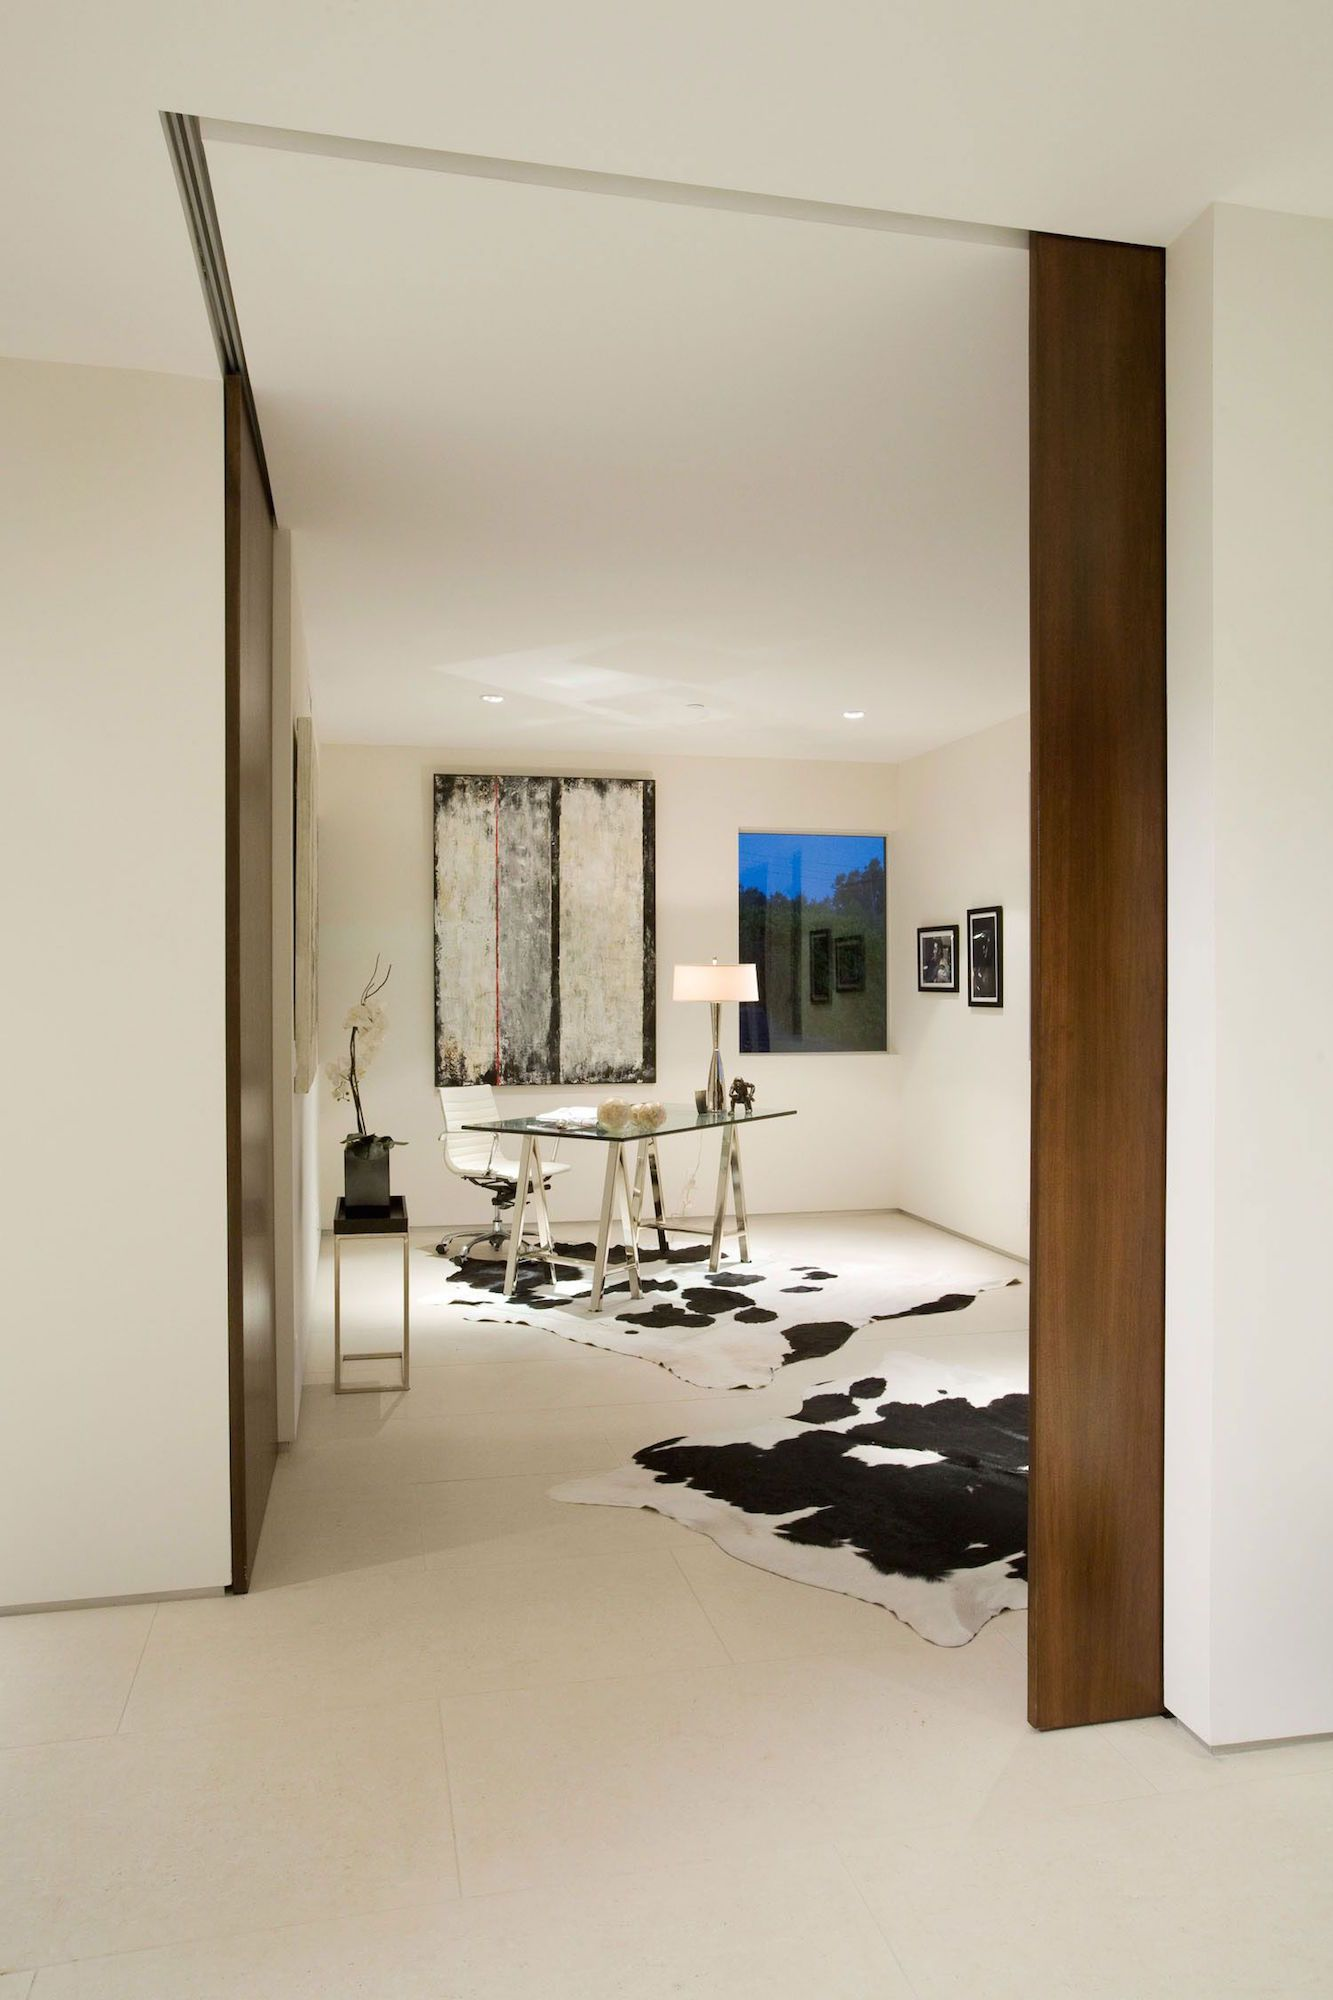 Kilrenney-Avenue-Residence-13